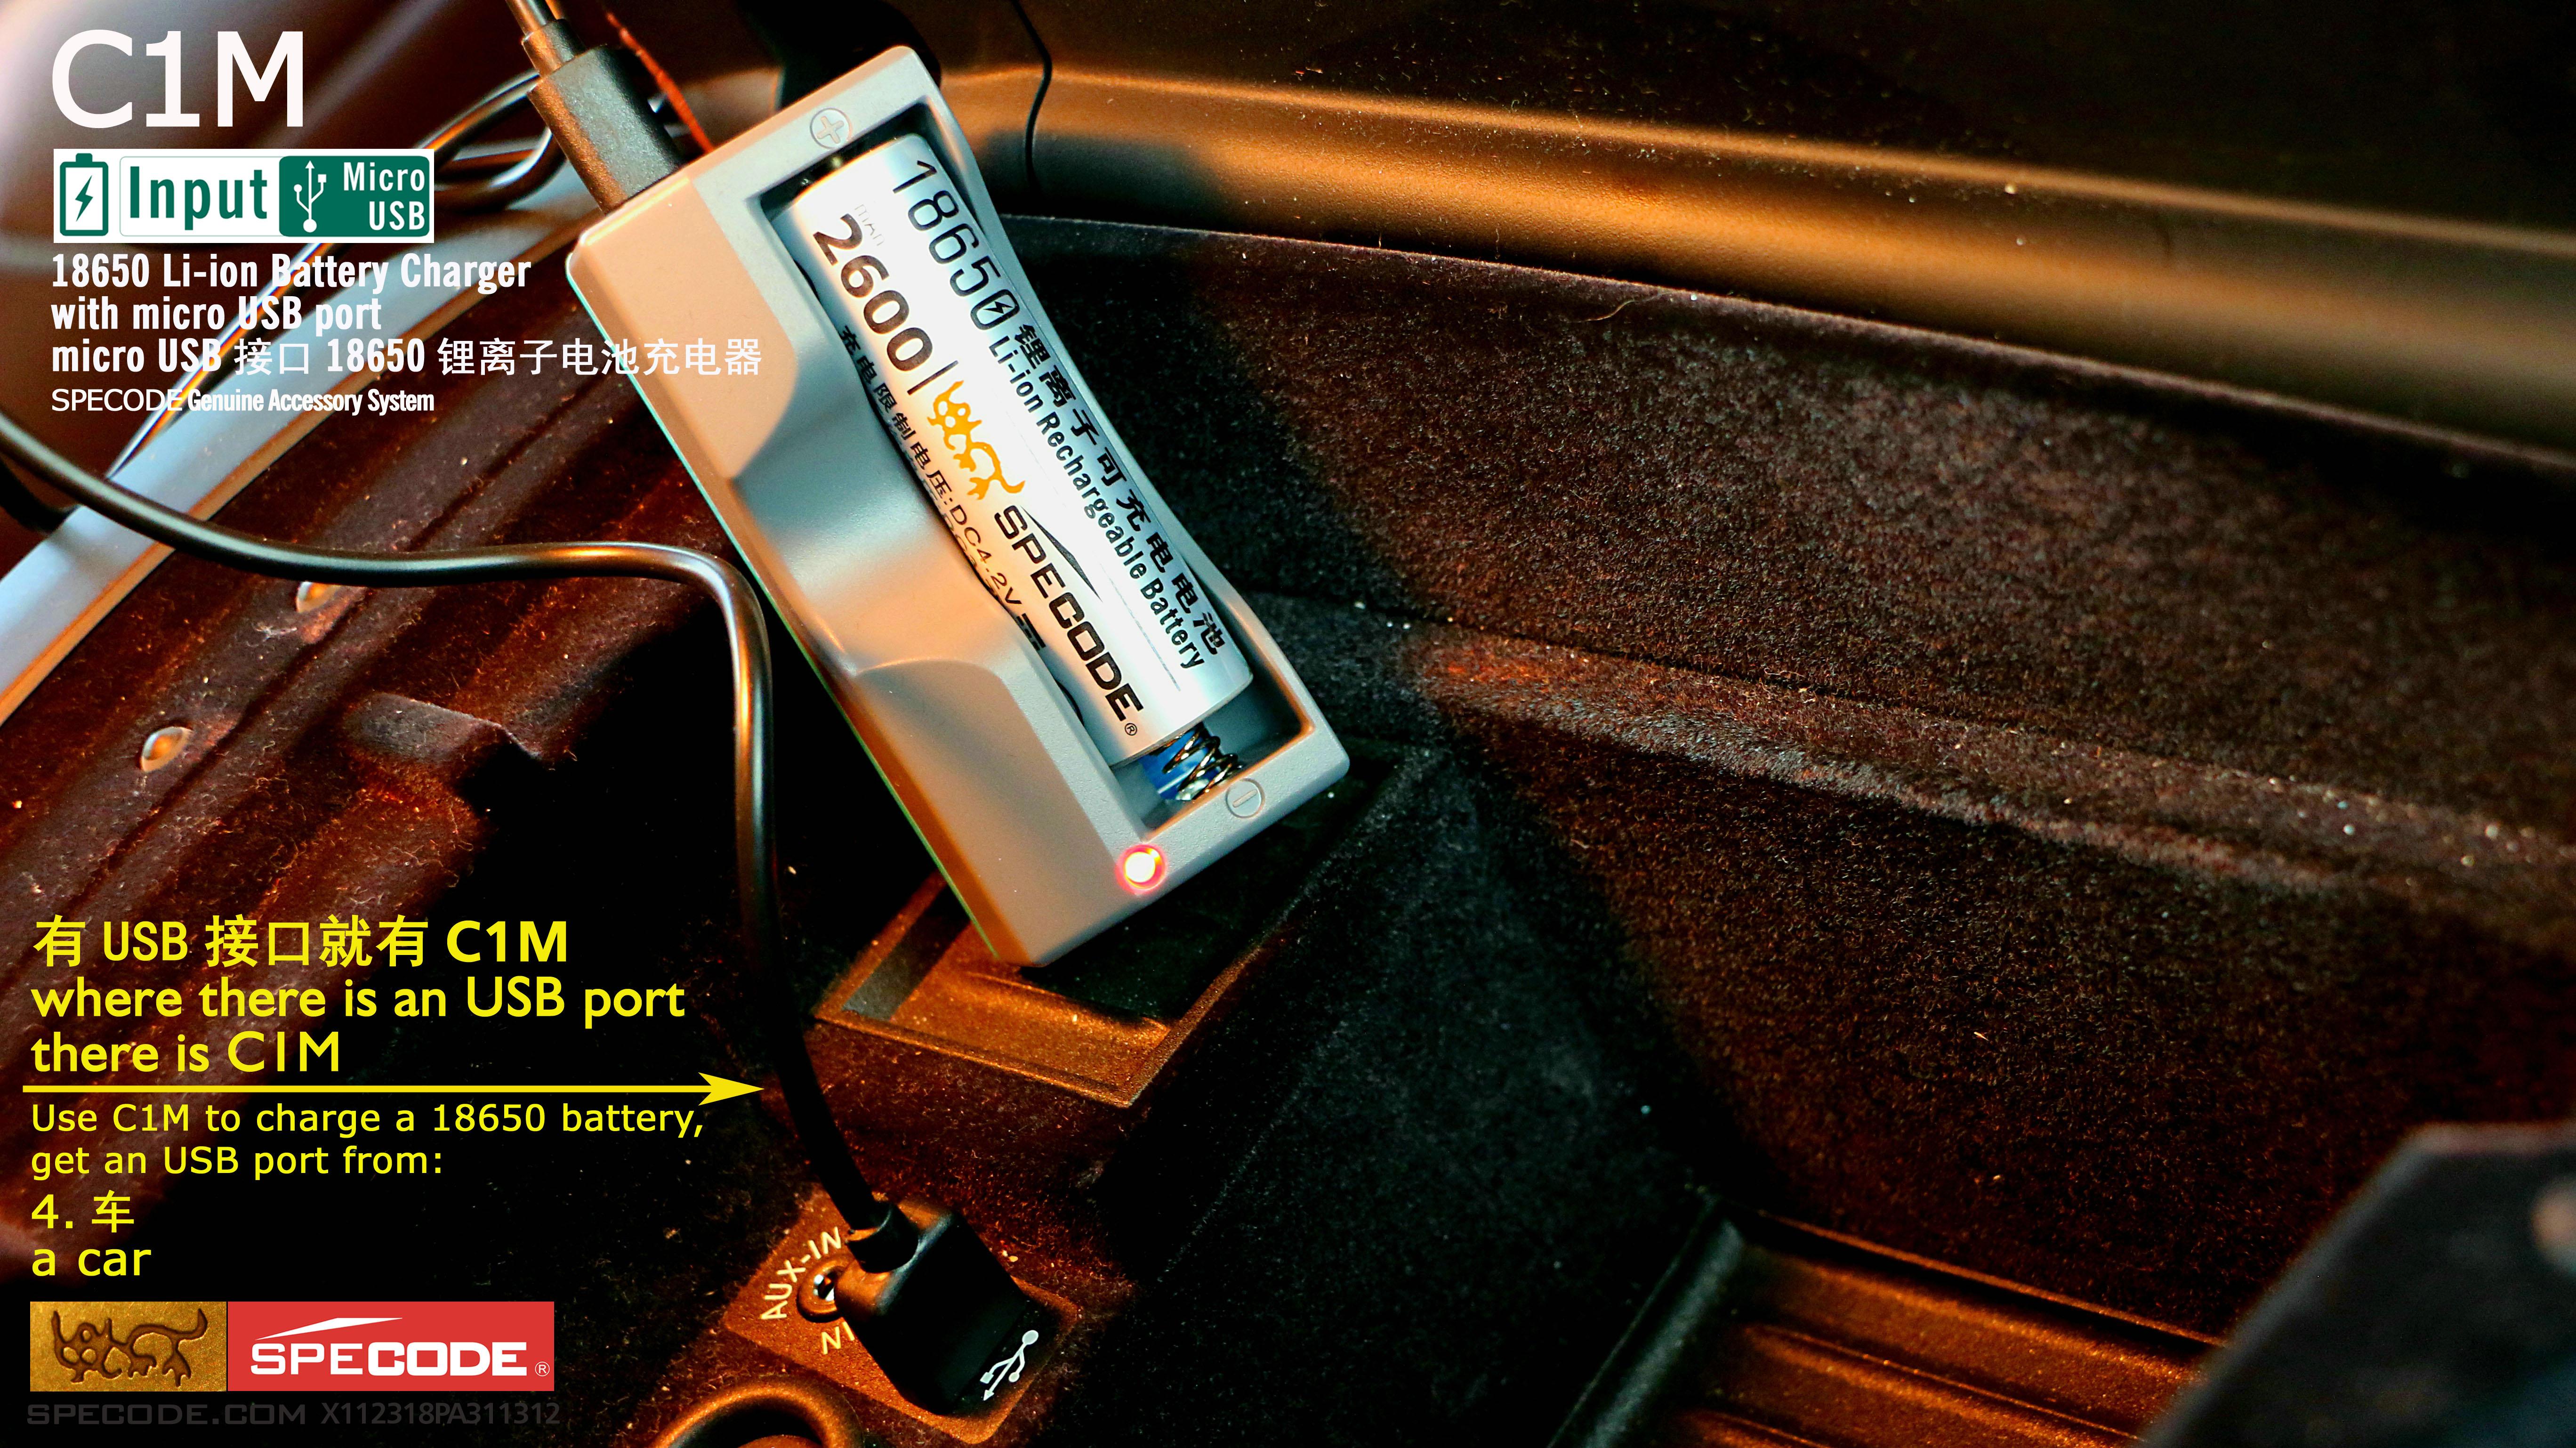 13181125-官图-Cn-SPECODE-C1M-4-用车载USB接口